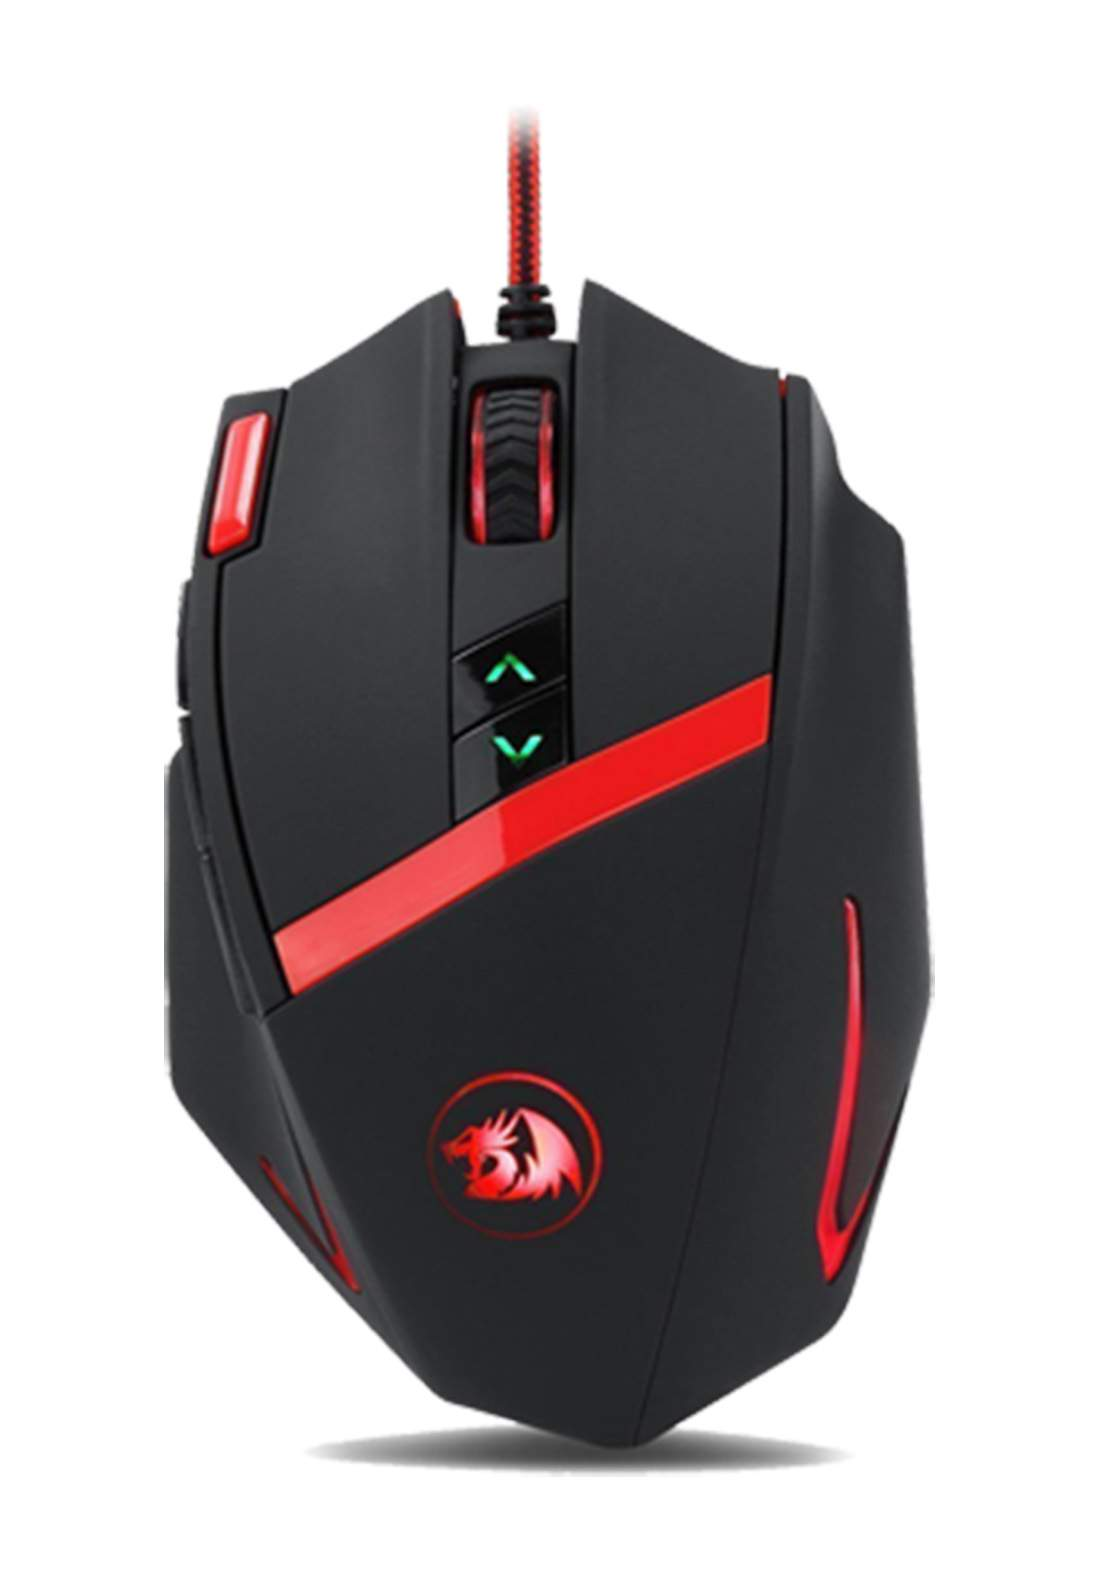 Redragon MAMMOTH M801 Wired Laser Gaming Mouse USB 2.0 - Black فأرة